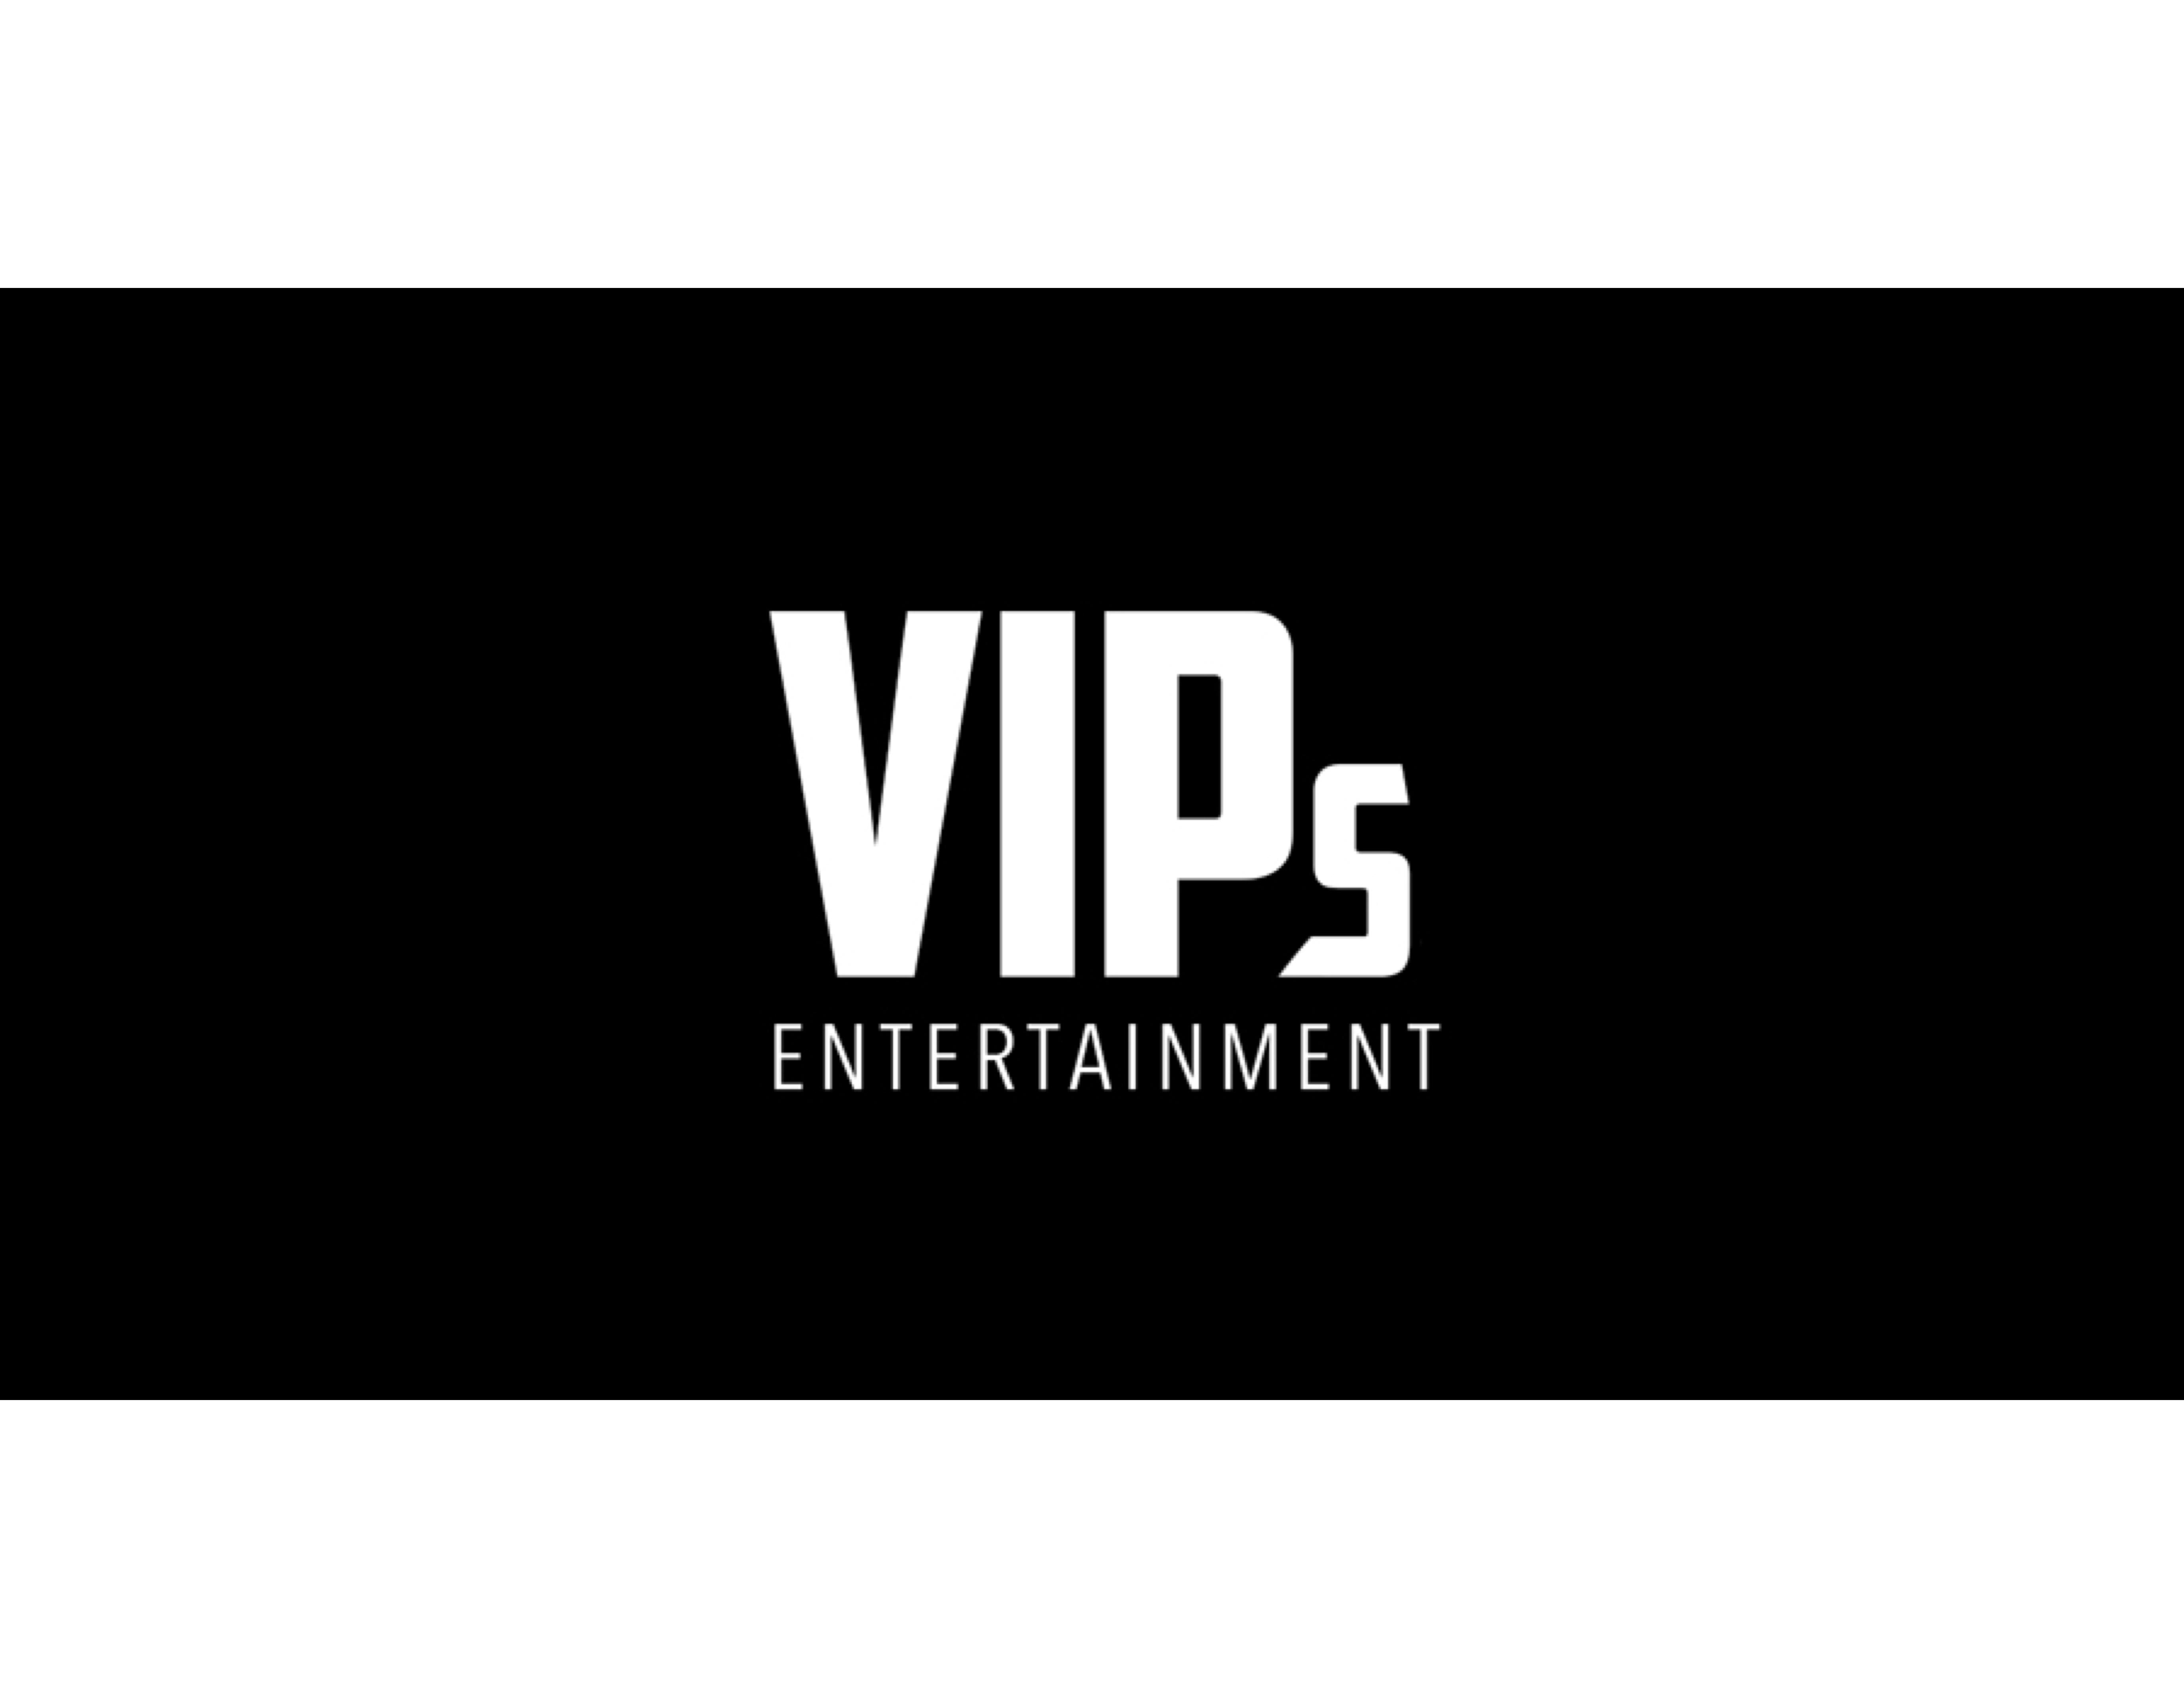 LOGO_VIPS.ENT.LLC